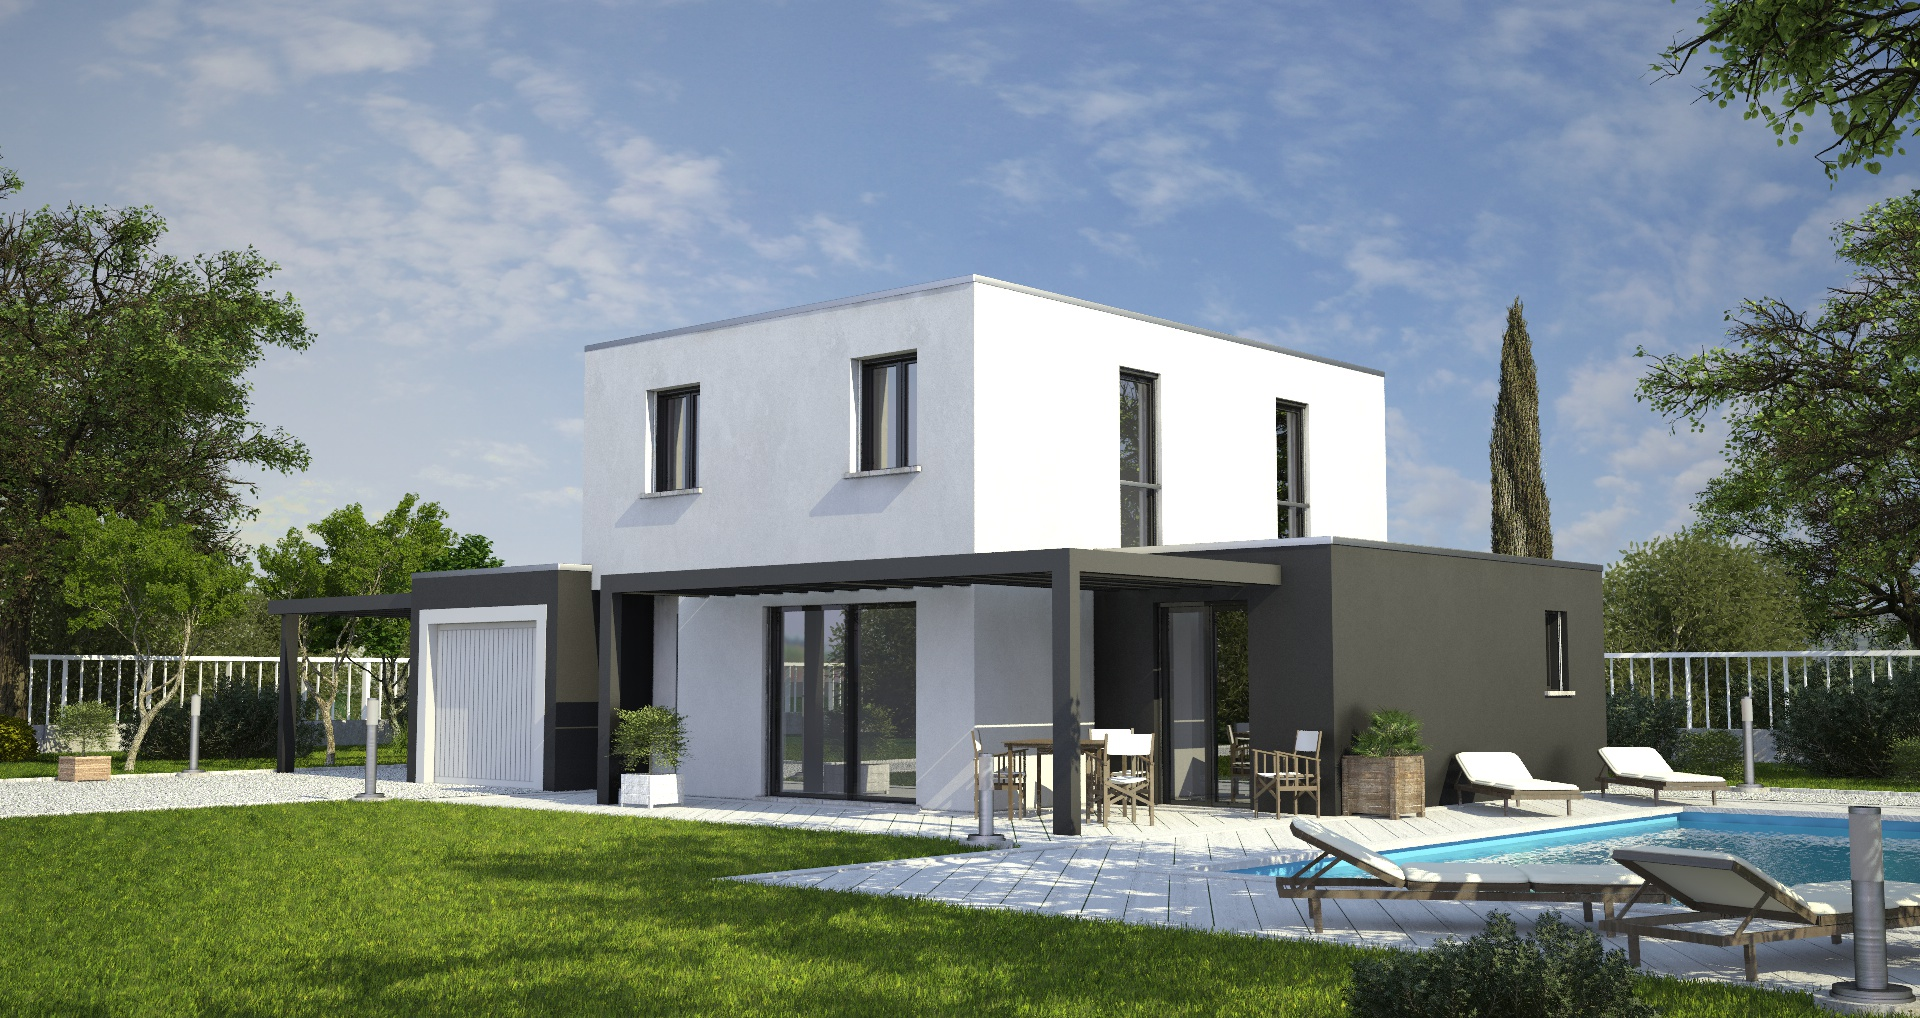 Annonce vente maison meyzieu 69330 105 m 460 000 for Prix m2 meyzieu